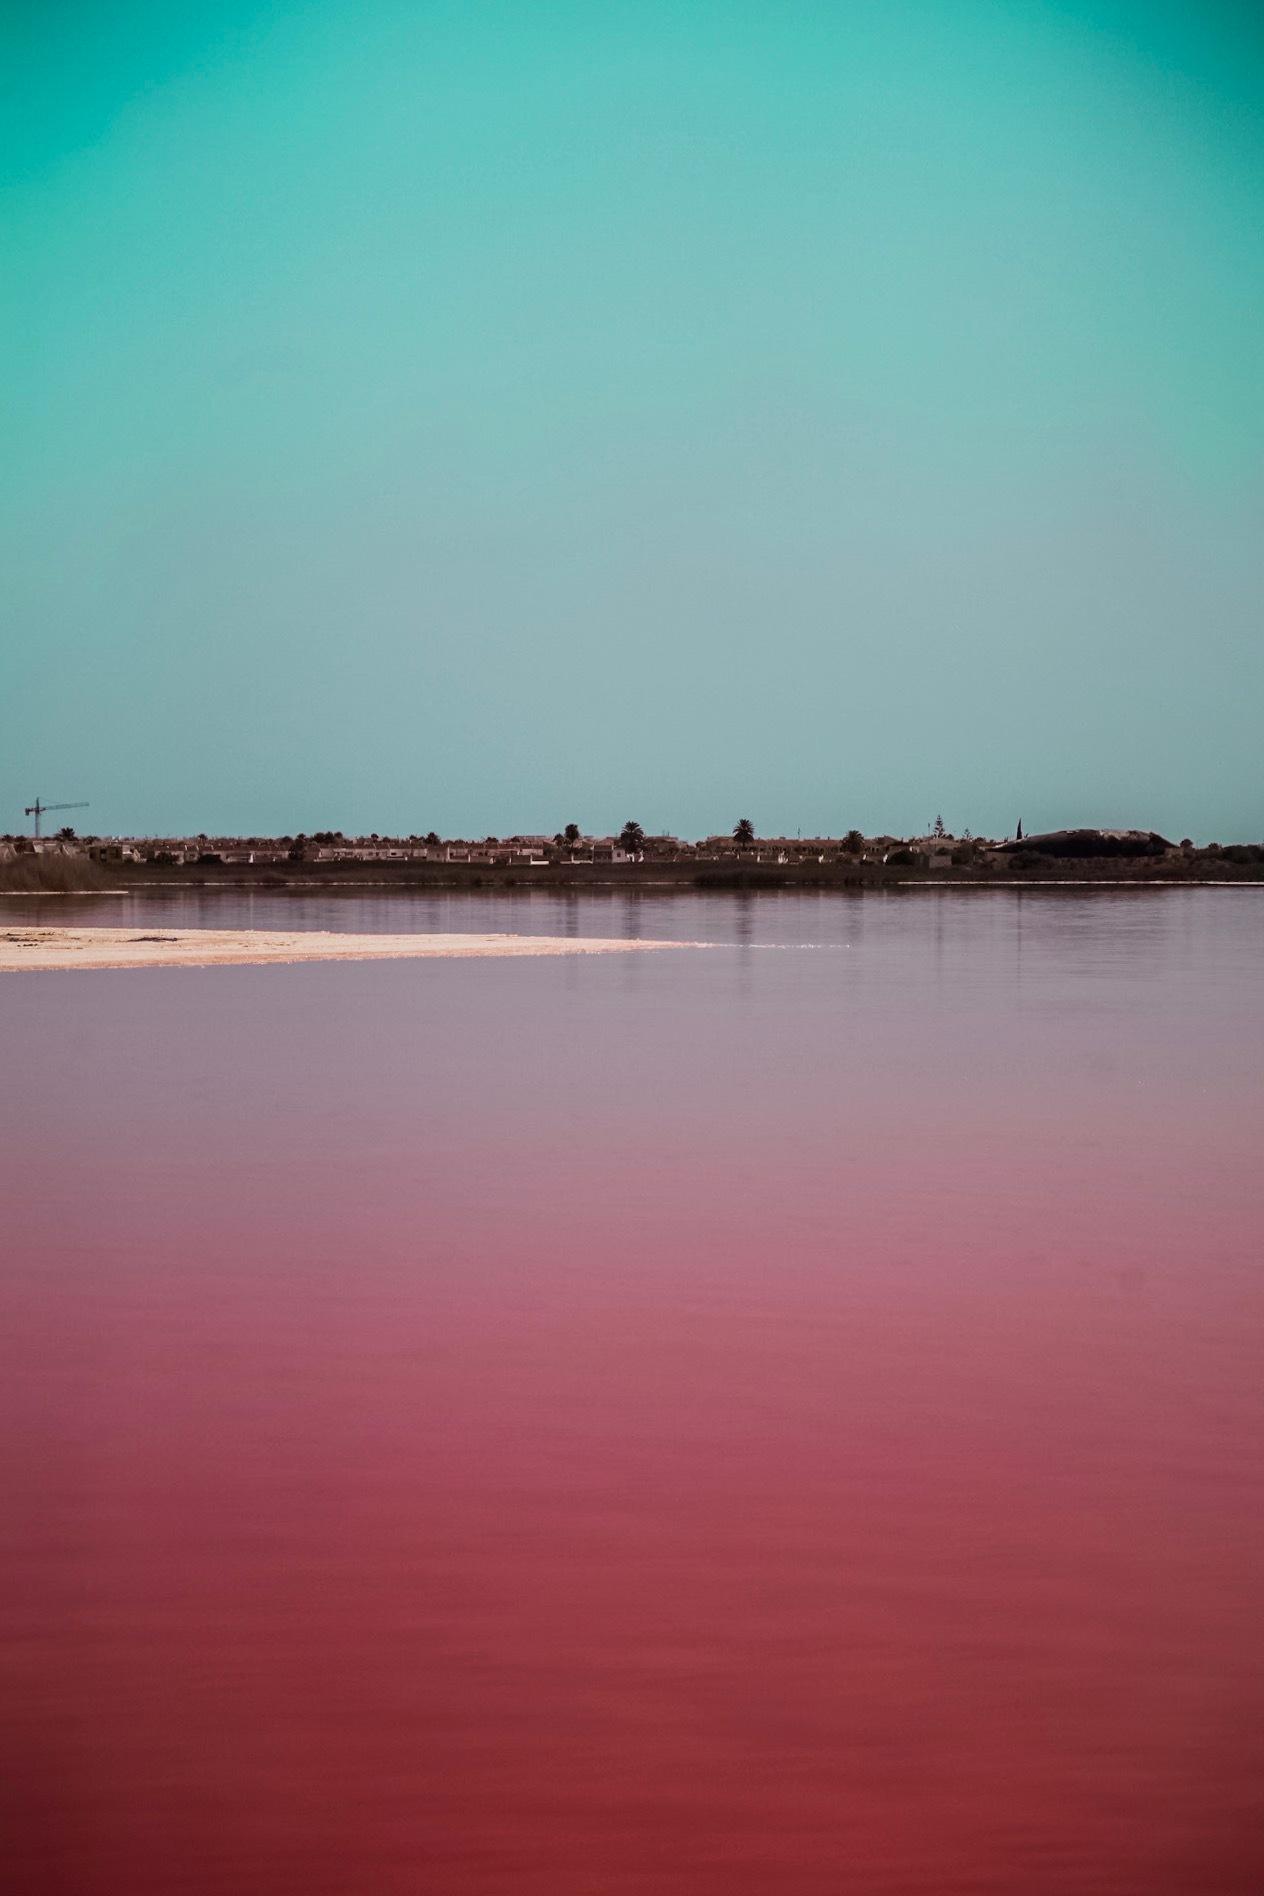 COOL LAKE by Jah Mz